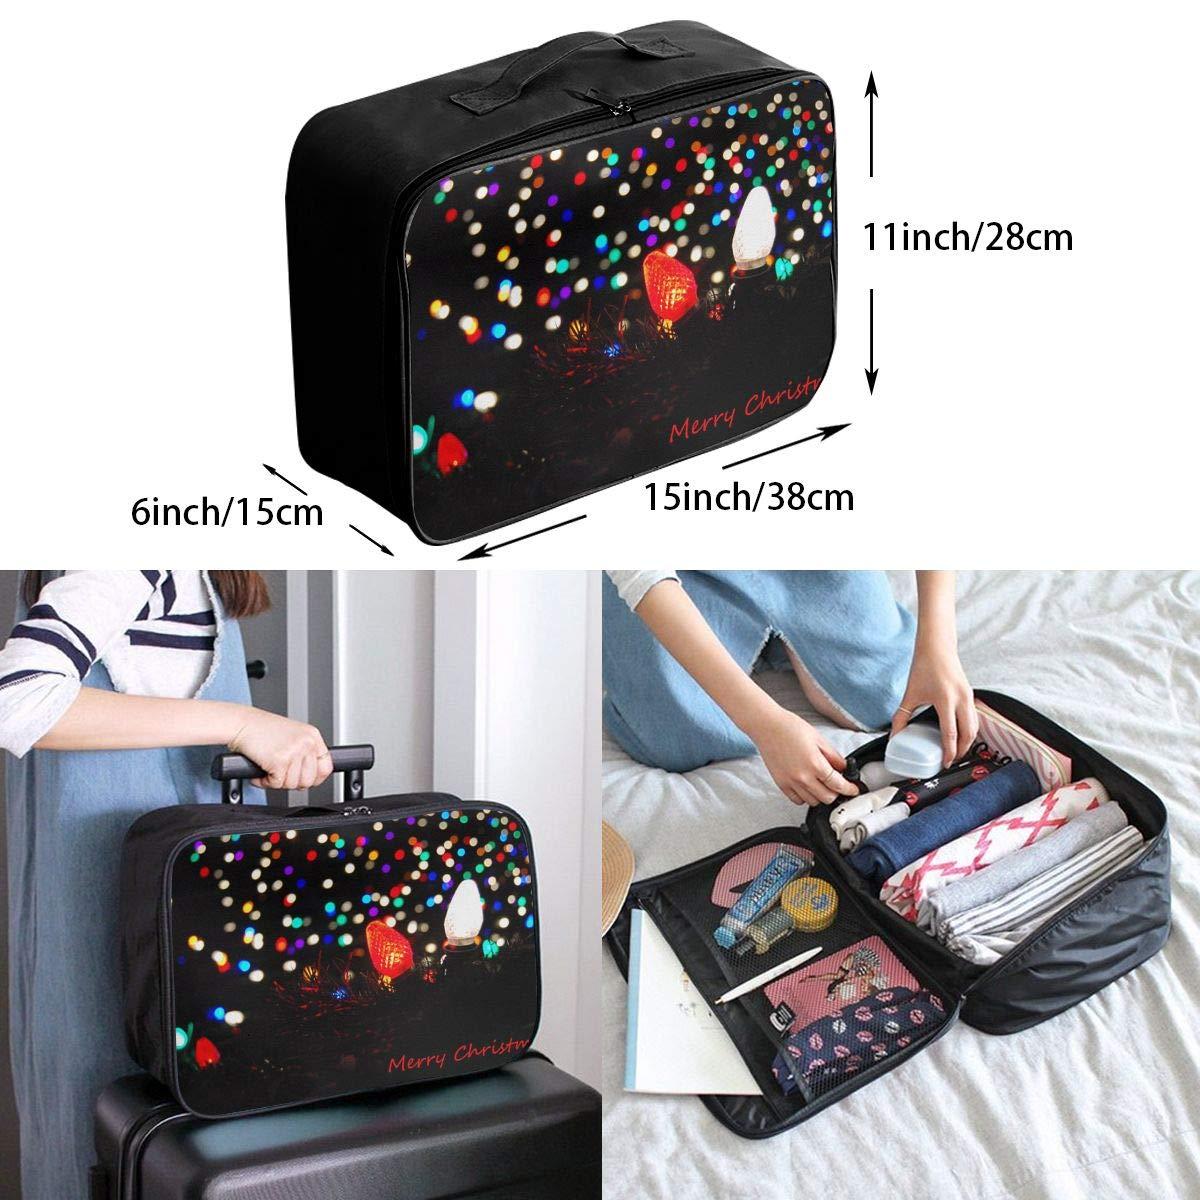 Travel Luggage Duffle Bag Lightweight Portable Handbag Merry Christmas Large Capacity Waterproof Foldable Storage Tote